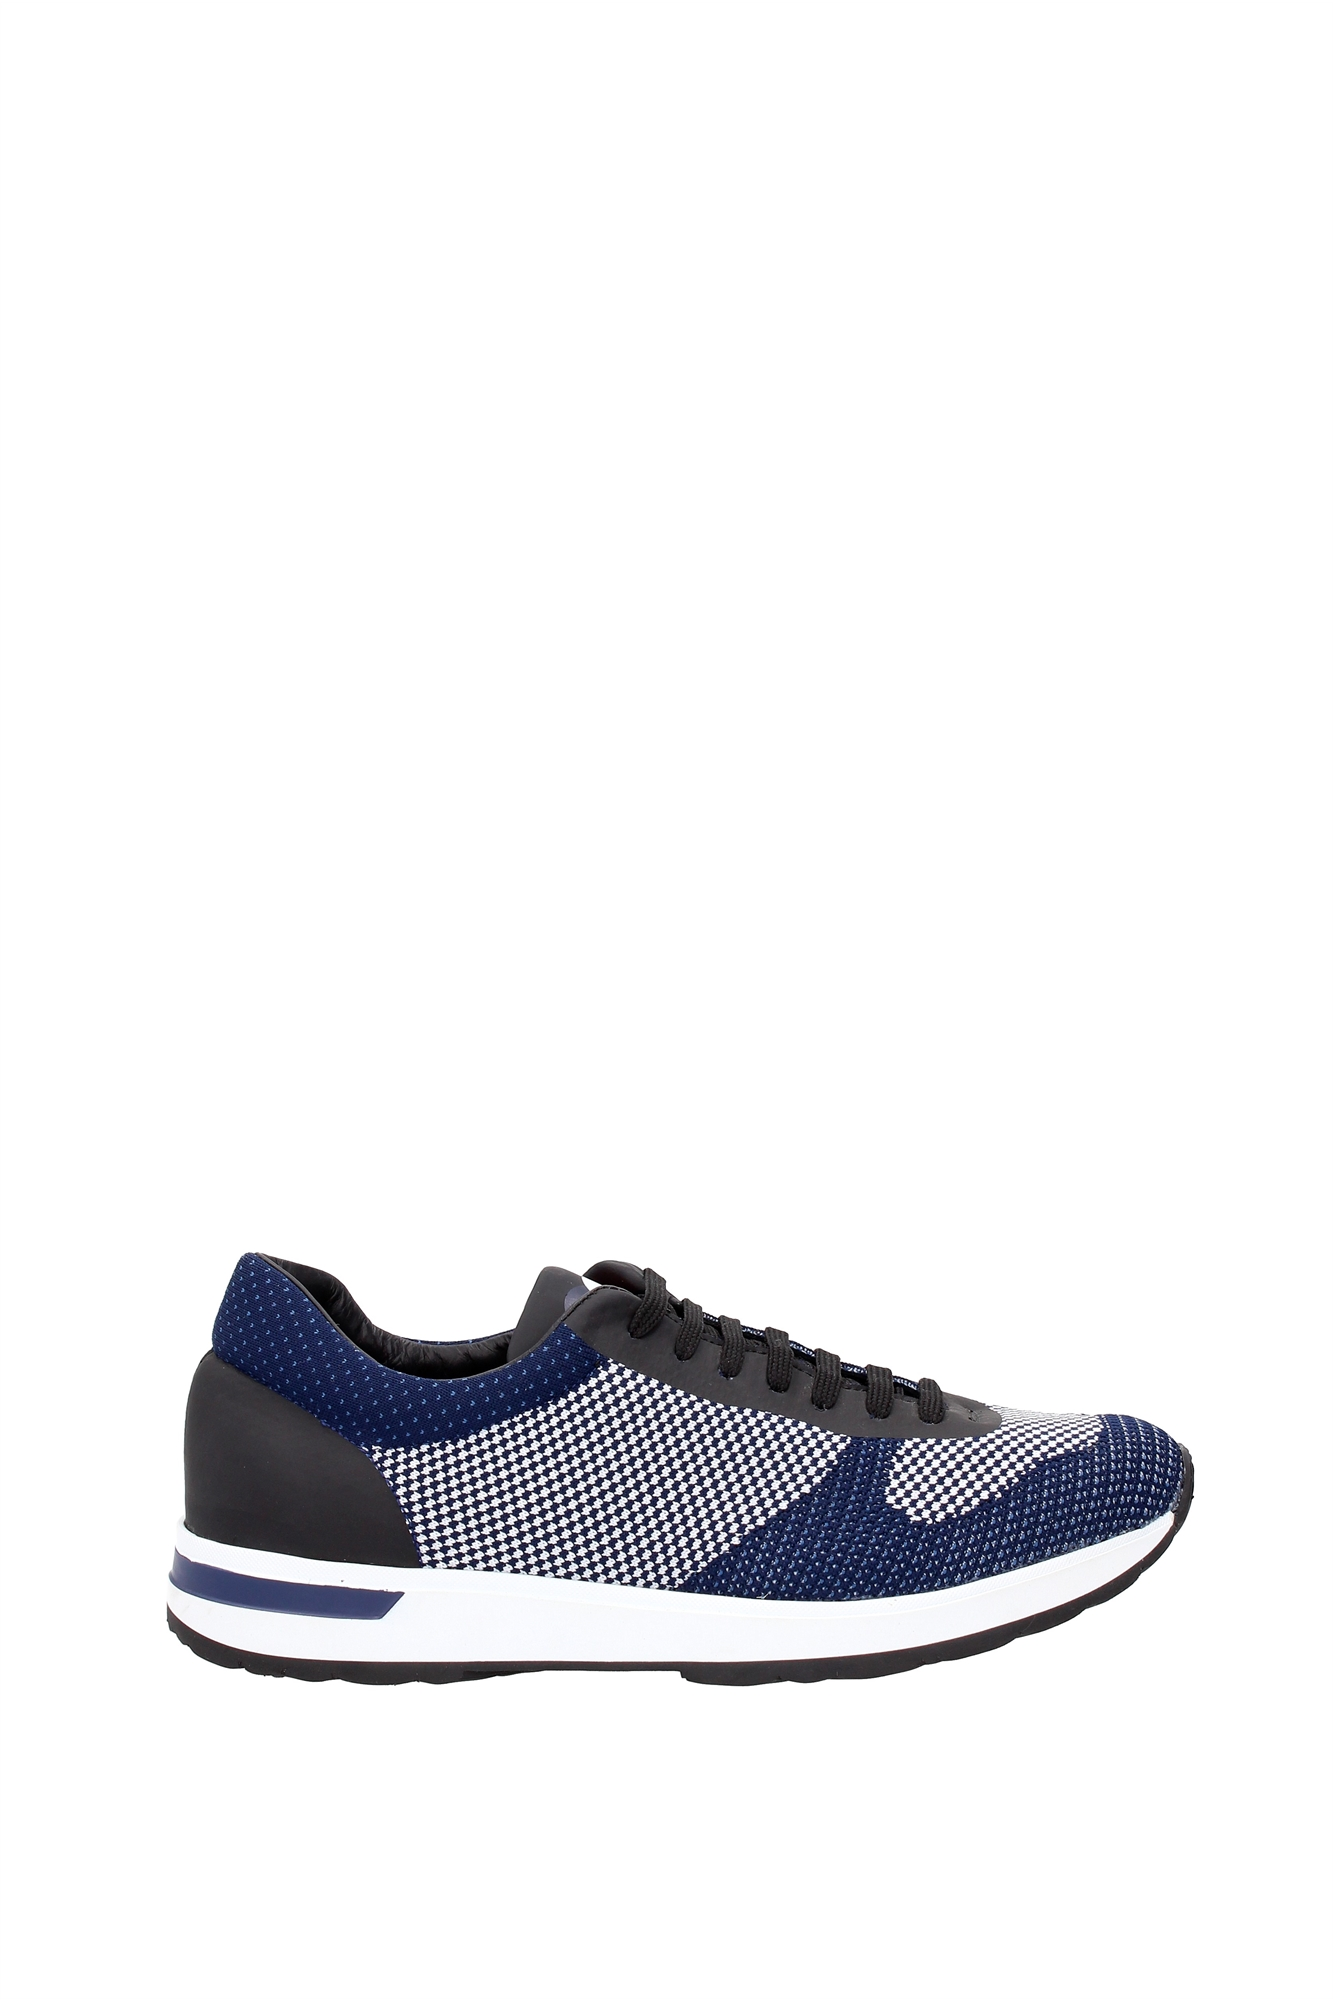 sneakers moncler herren stoff blau b109a101130007952746 ebay. Black Bedroom Furniture Sets. Home Design Ideas